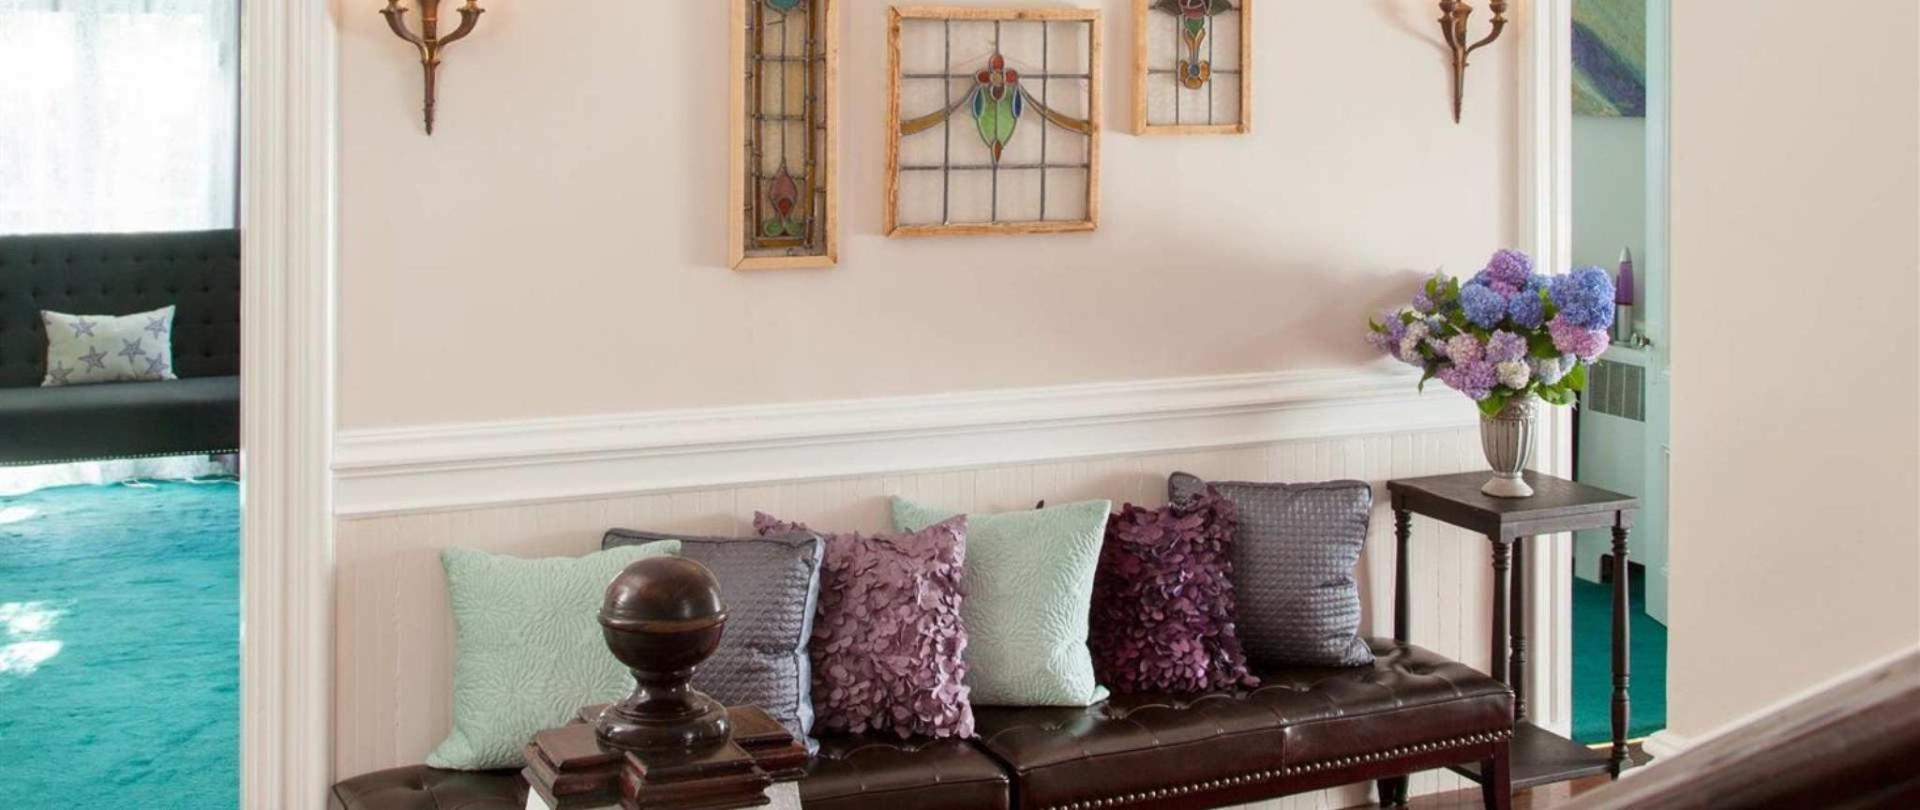 Catherine Foyer | Admiral Sims House Bed & Breakfast, Newport RI